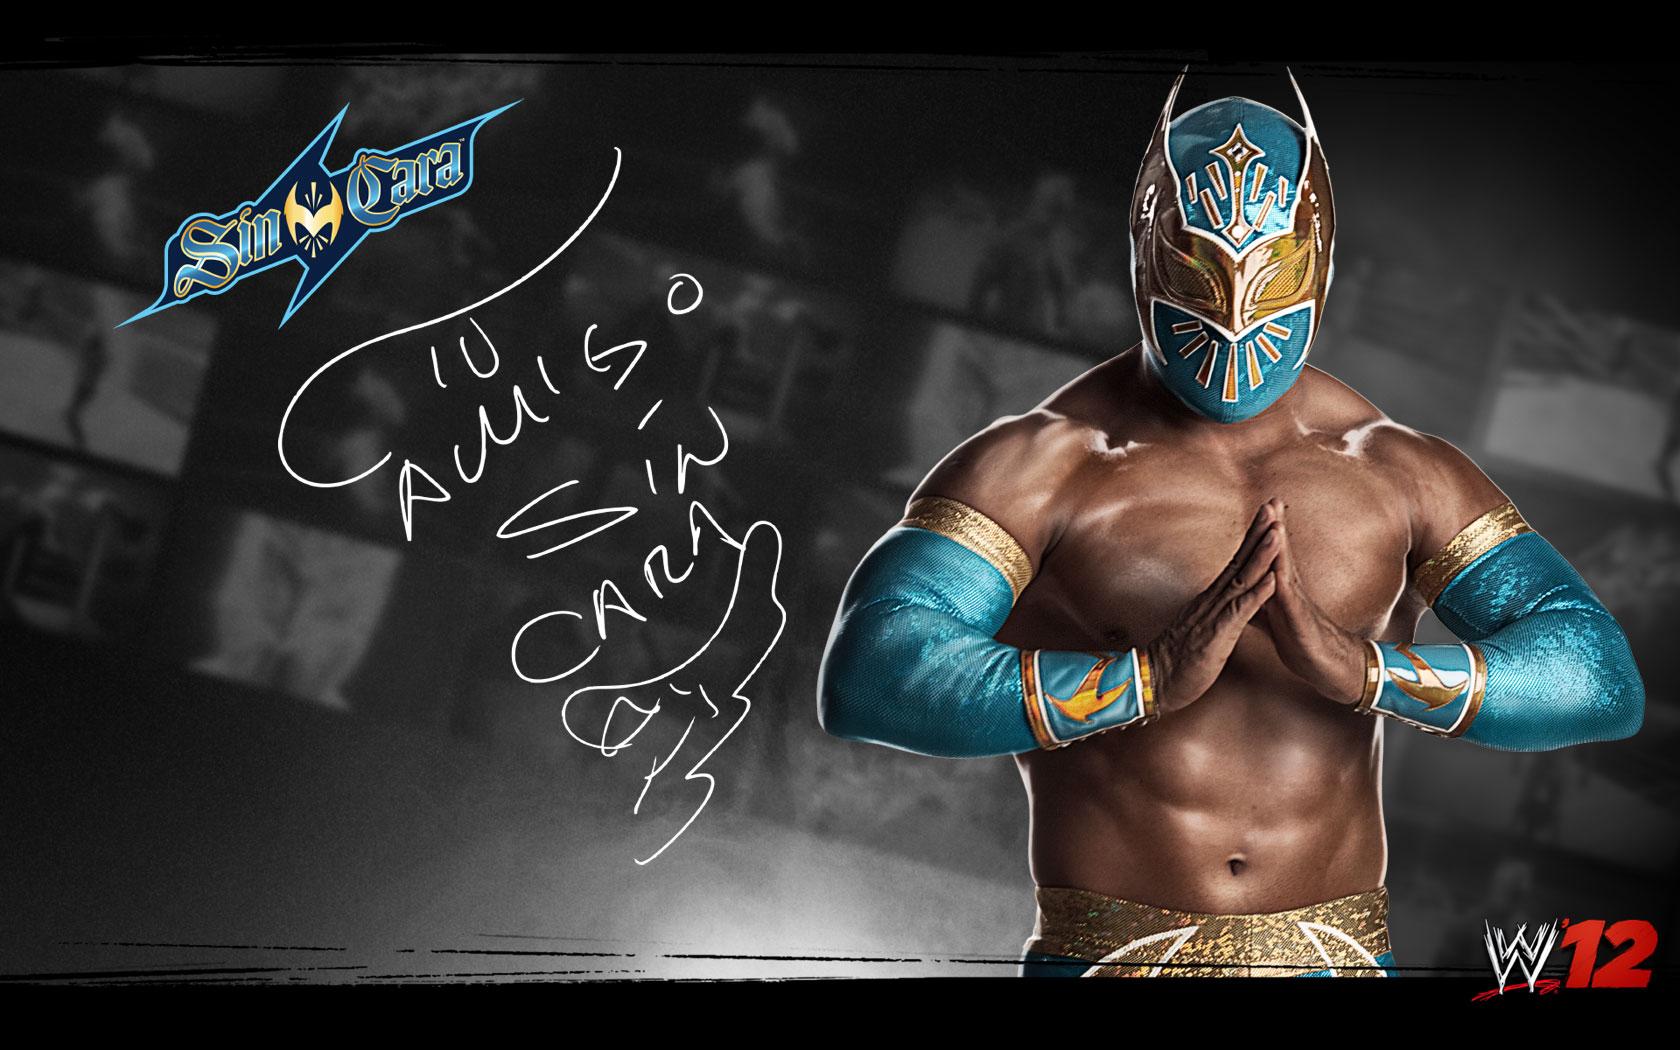 Download HIGH FLYIN WWE 12 Wallpapers WWE Wallpapers 1680x1050